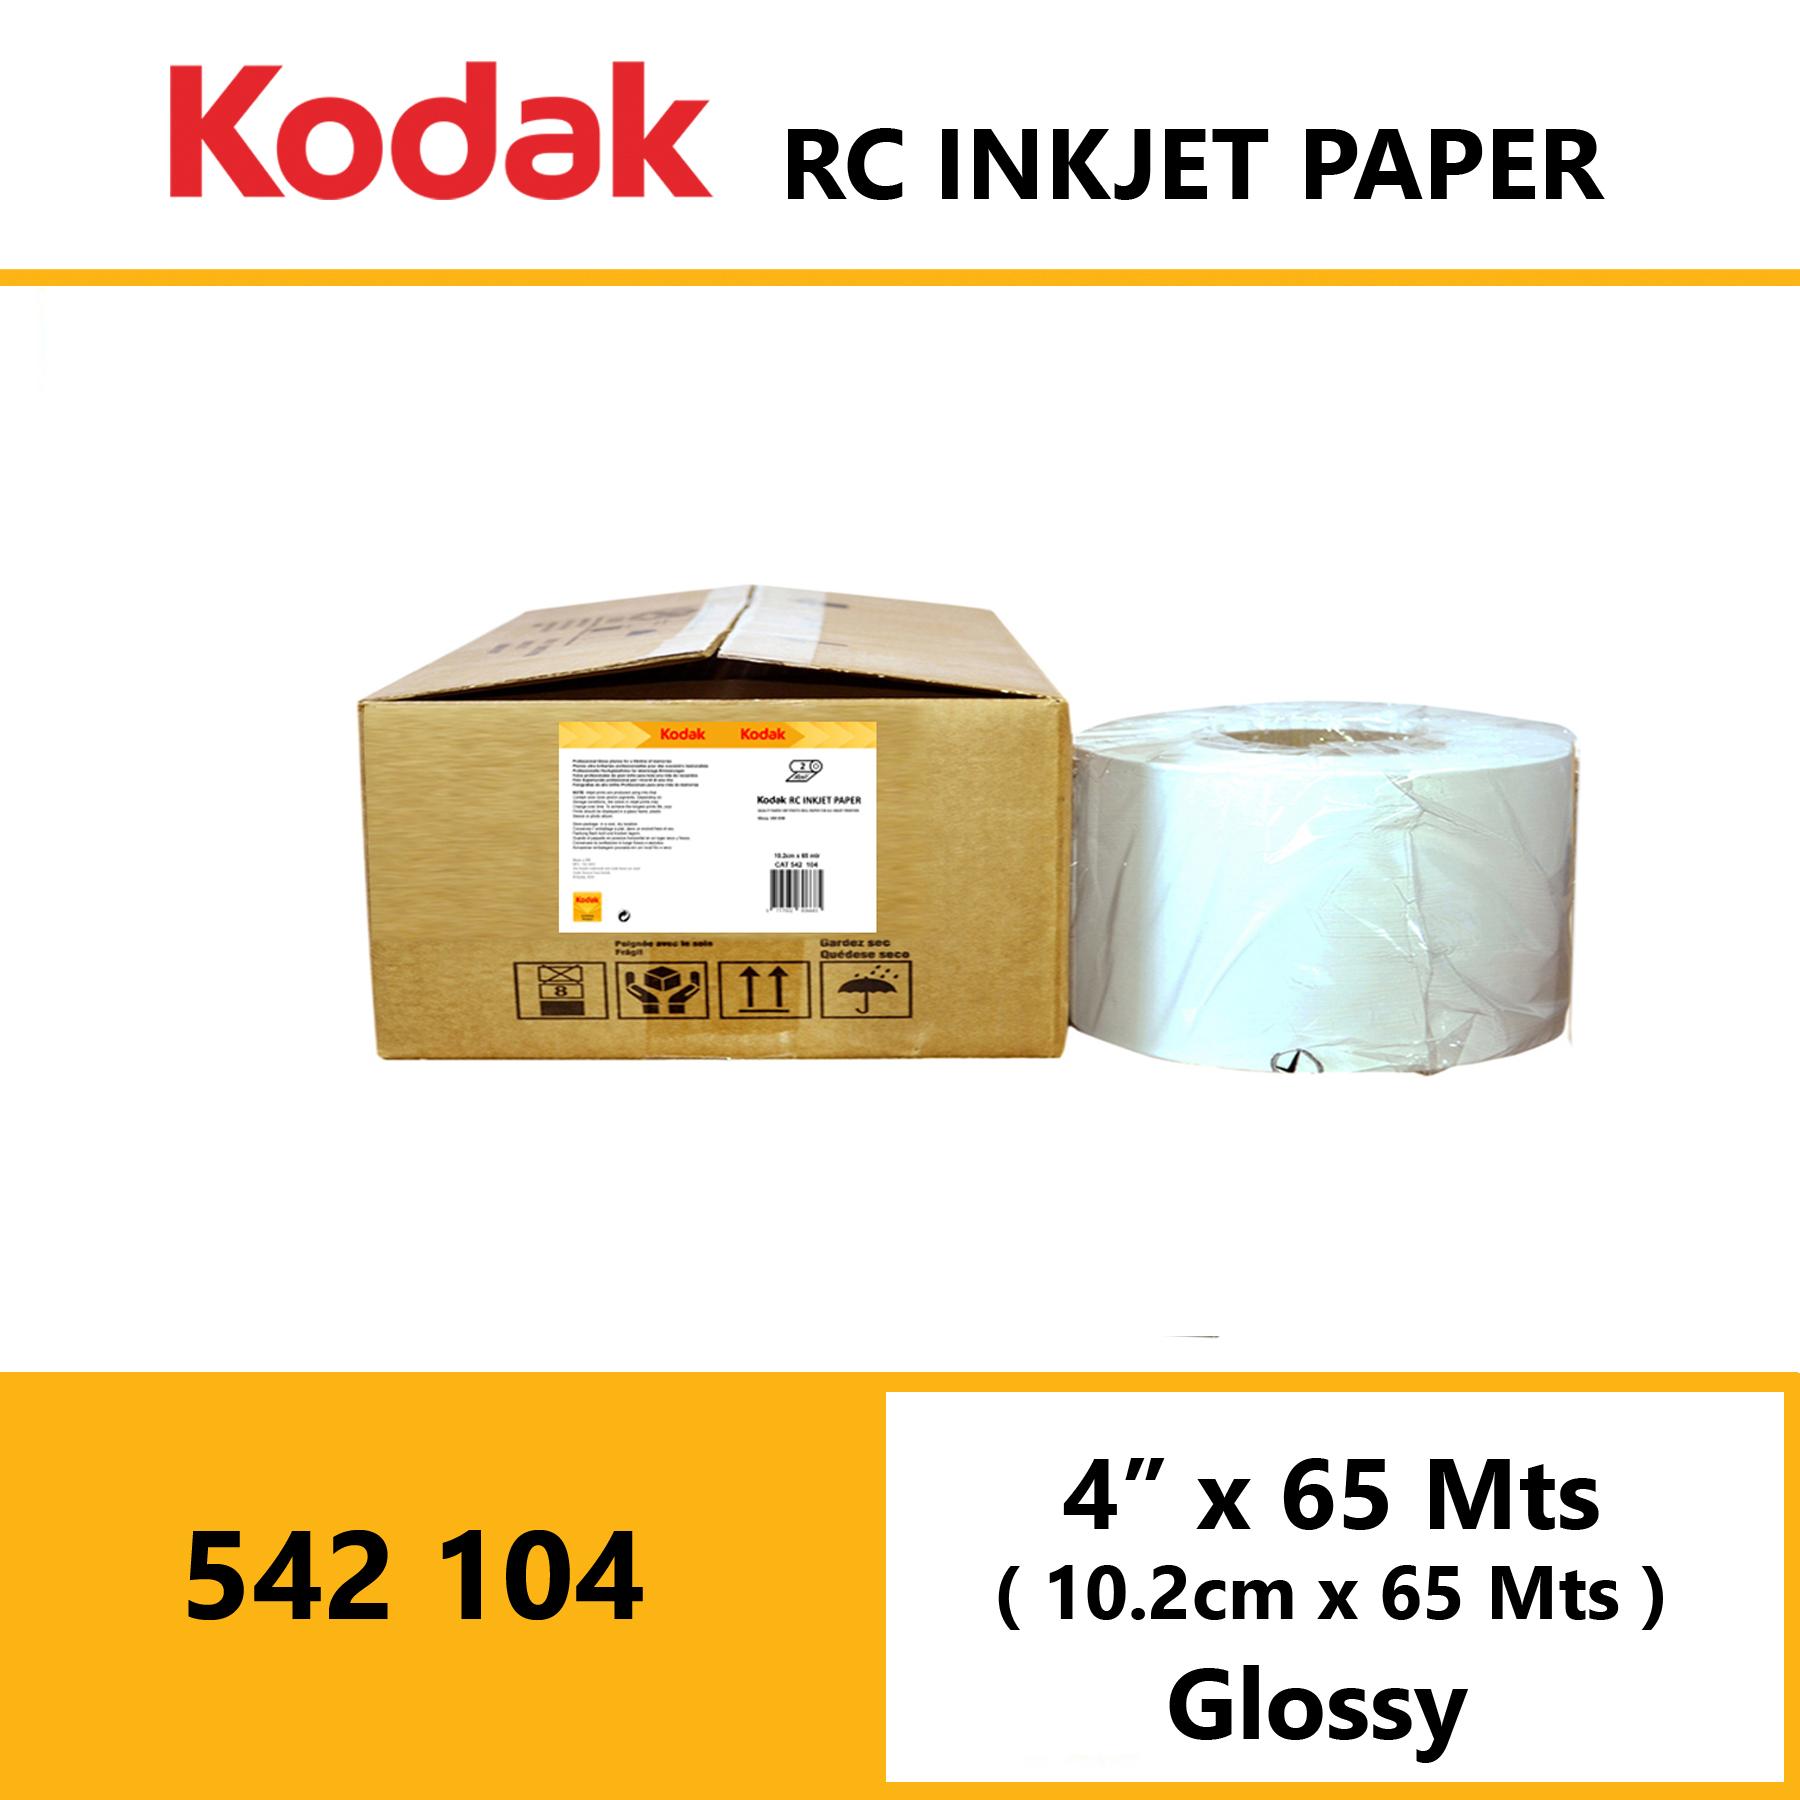 "Kodak Inkjet RC Paper 4 "" x 65 Mtrs Glossy"